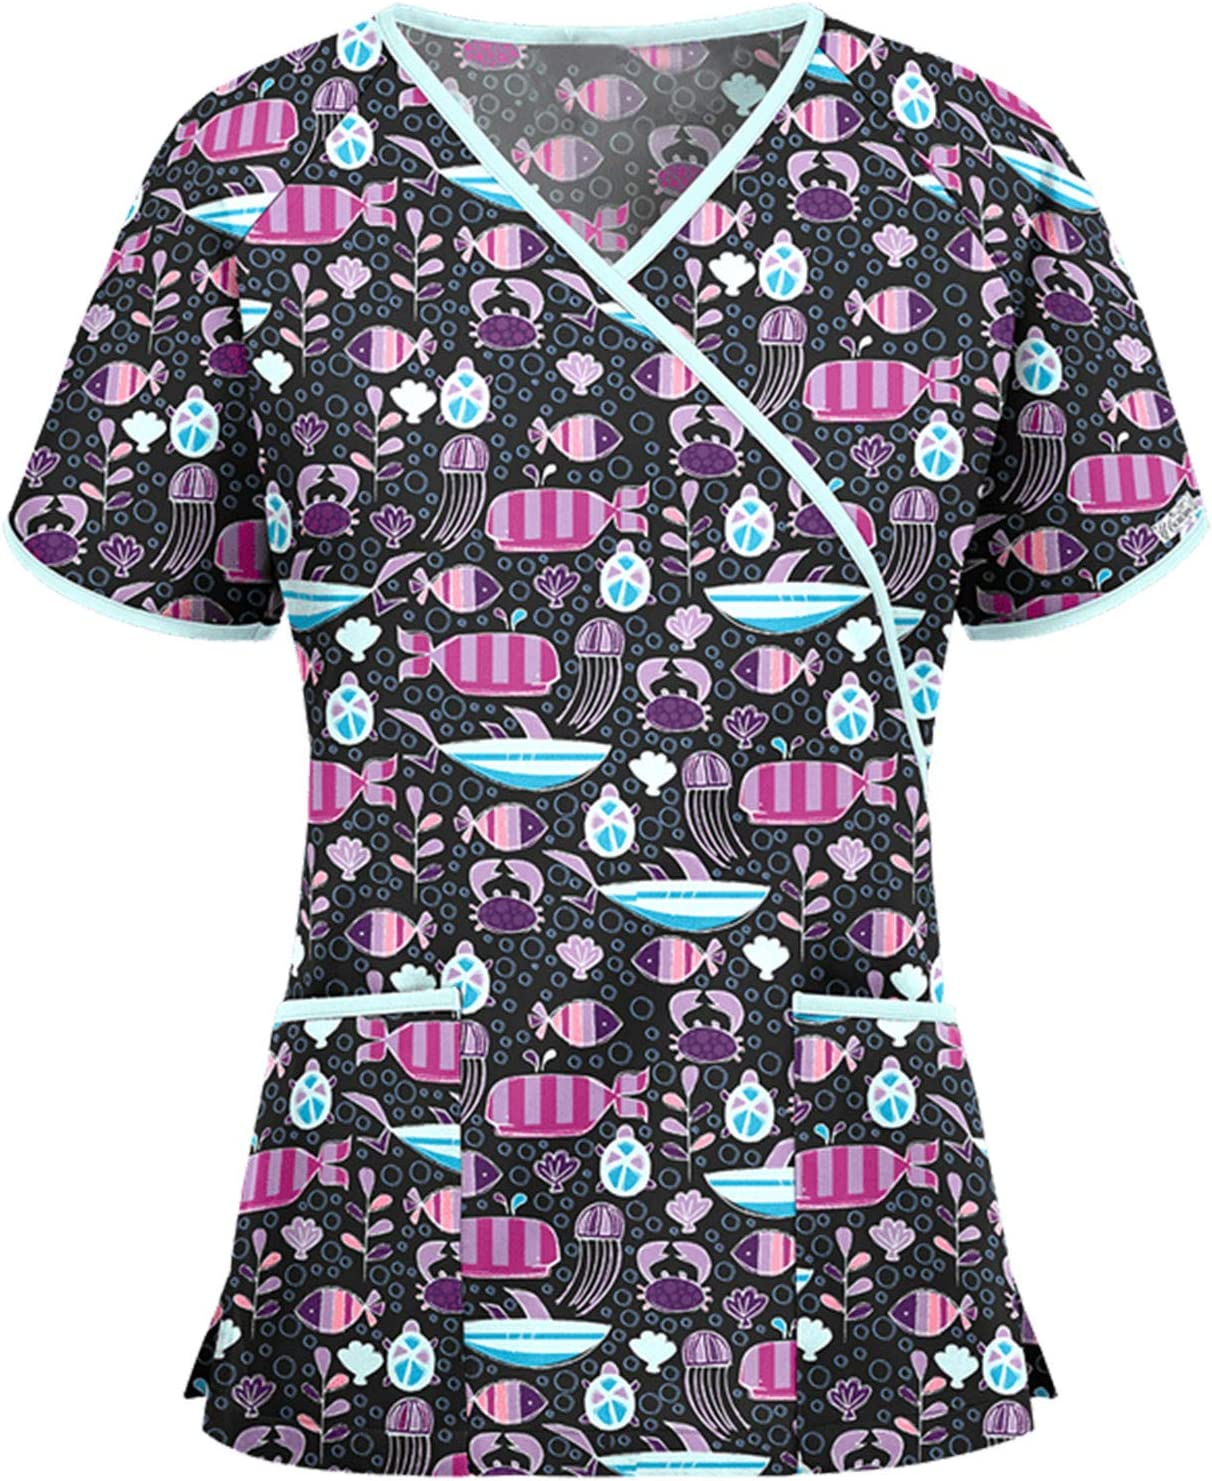 KKYU Women Summer Mock Wrap Tops Working Uniform T-Shirt Easter Print Short Sleeve V-Neck Blouse Workwear with 2 Pockets